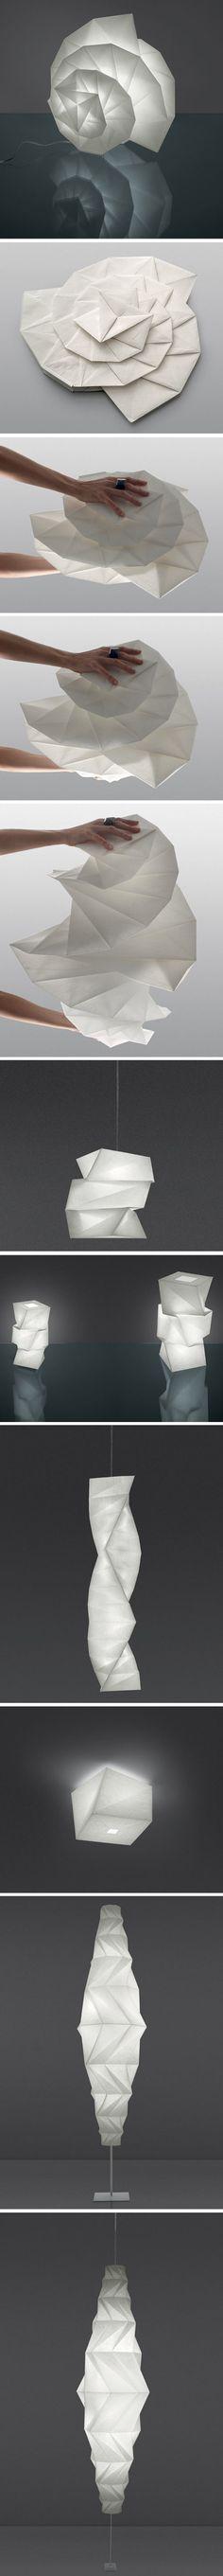 IN-EI par Issey Miyake pour Artemide - Journal du Design Issey Miyake, Origami Cube, Origami Art, Origami Flowers, Art Design, Paper Design, Bedside Lamps Luxury, Design Origami, Origami Fashion